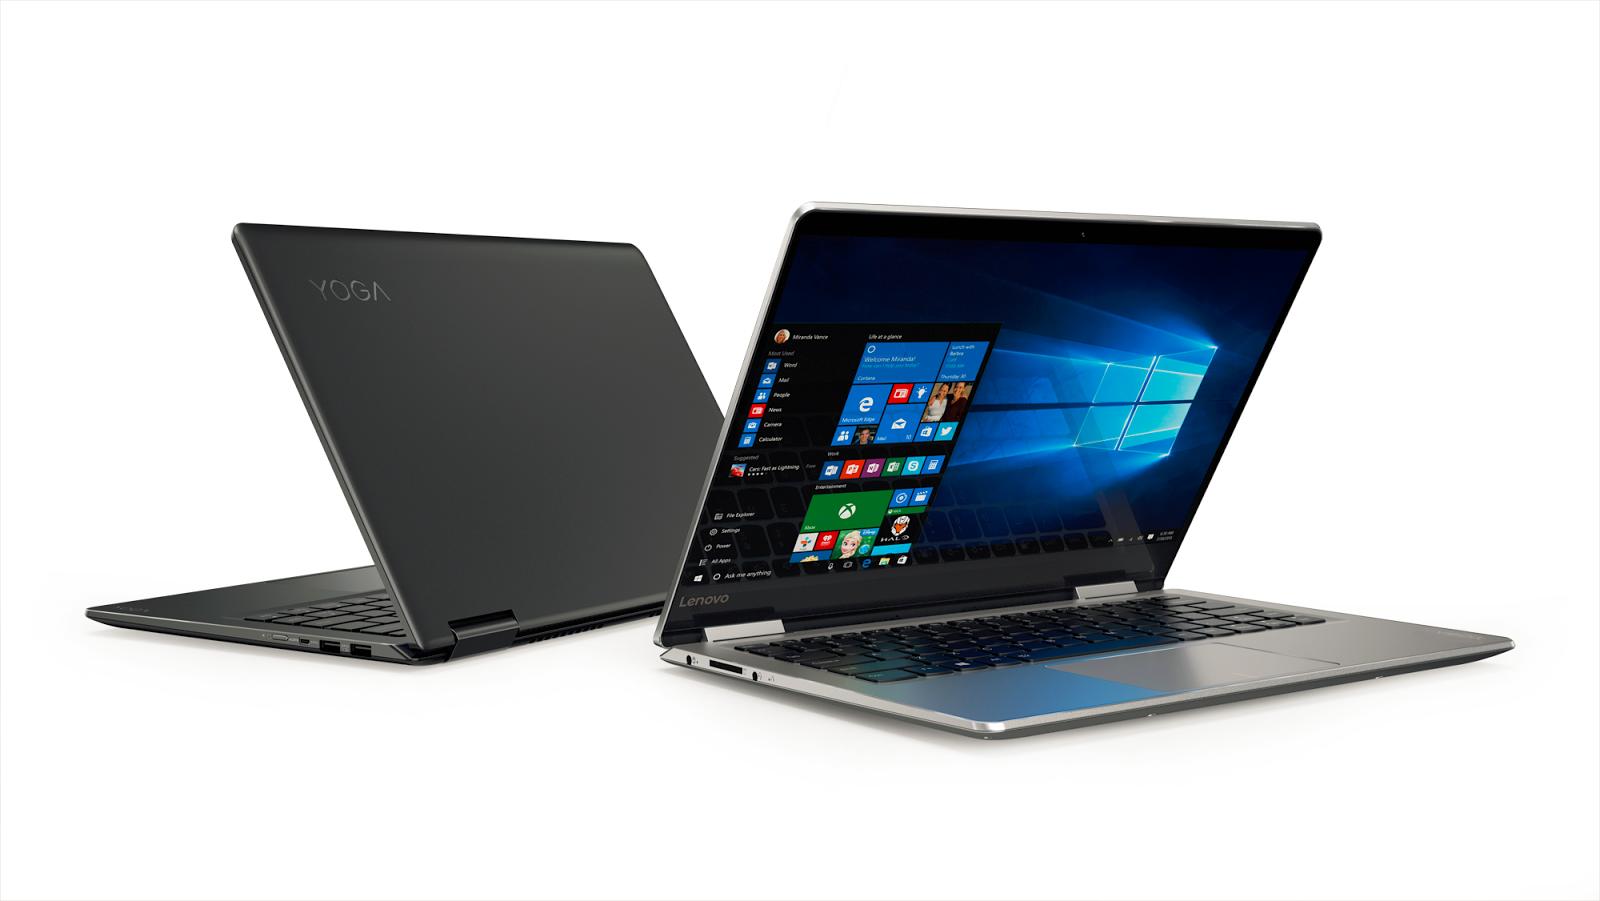 Зачем Lenovo установила Wi-Fi-модуль в шарнир ноутбука? - 1